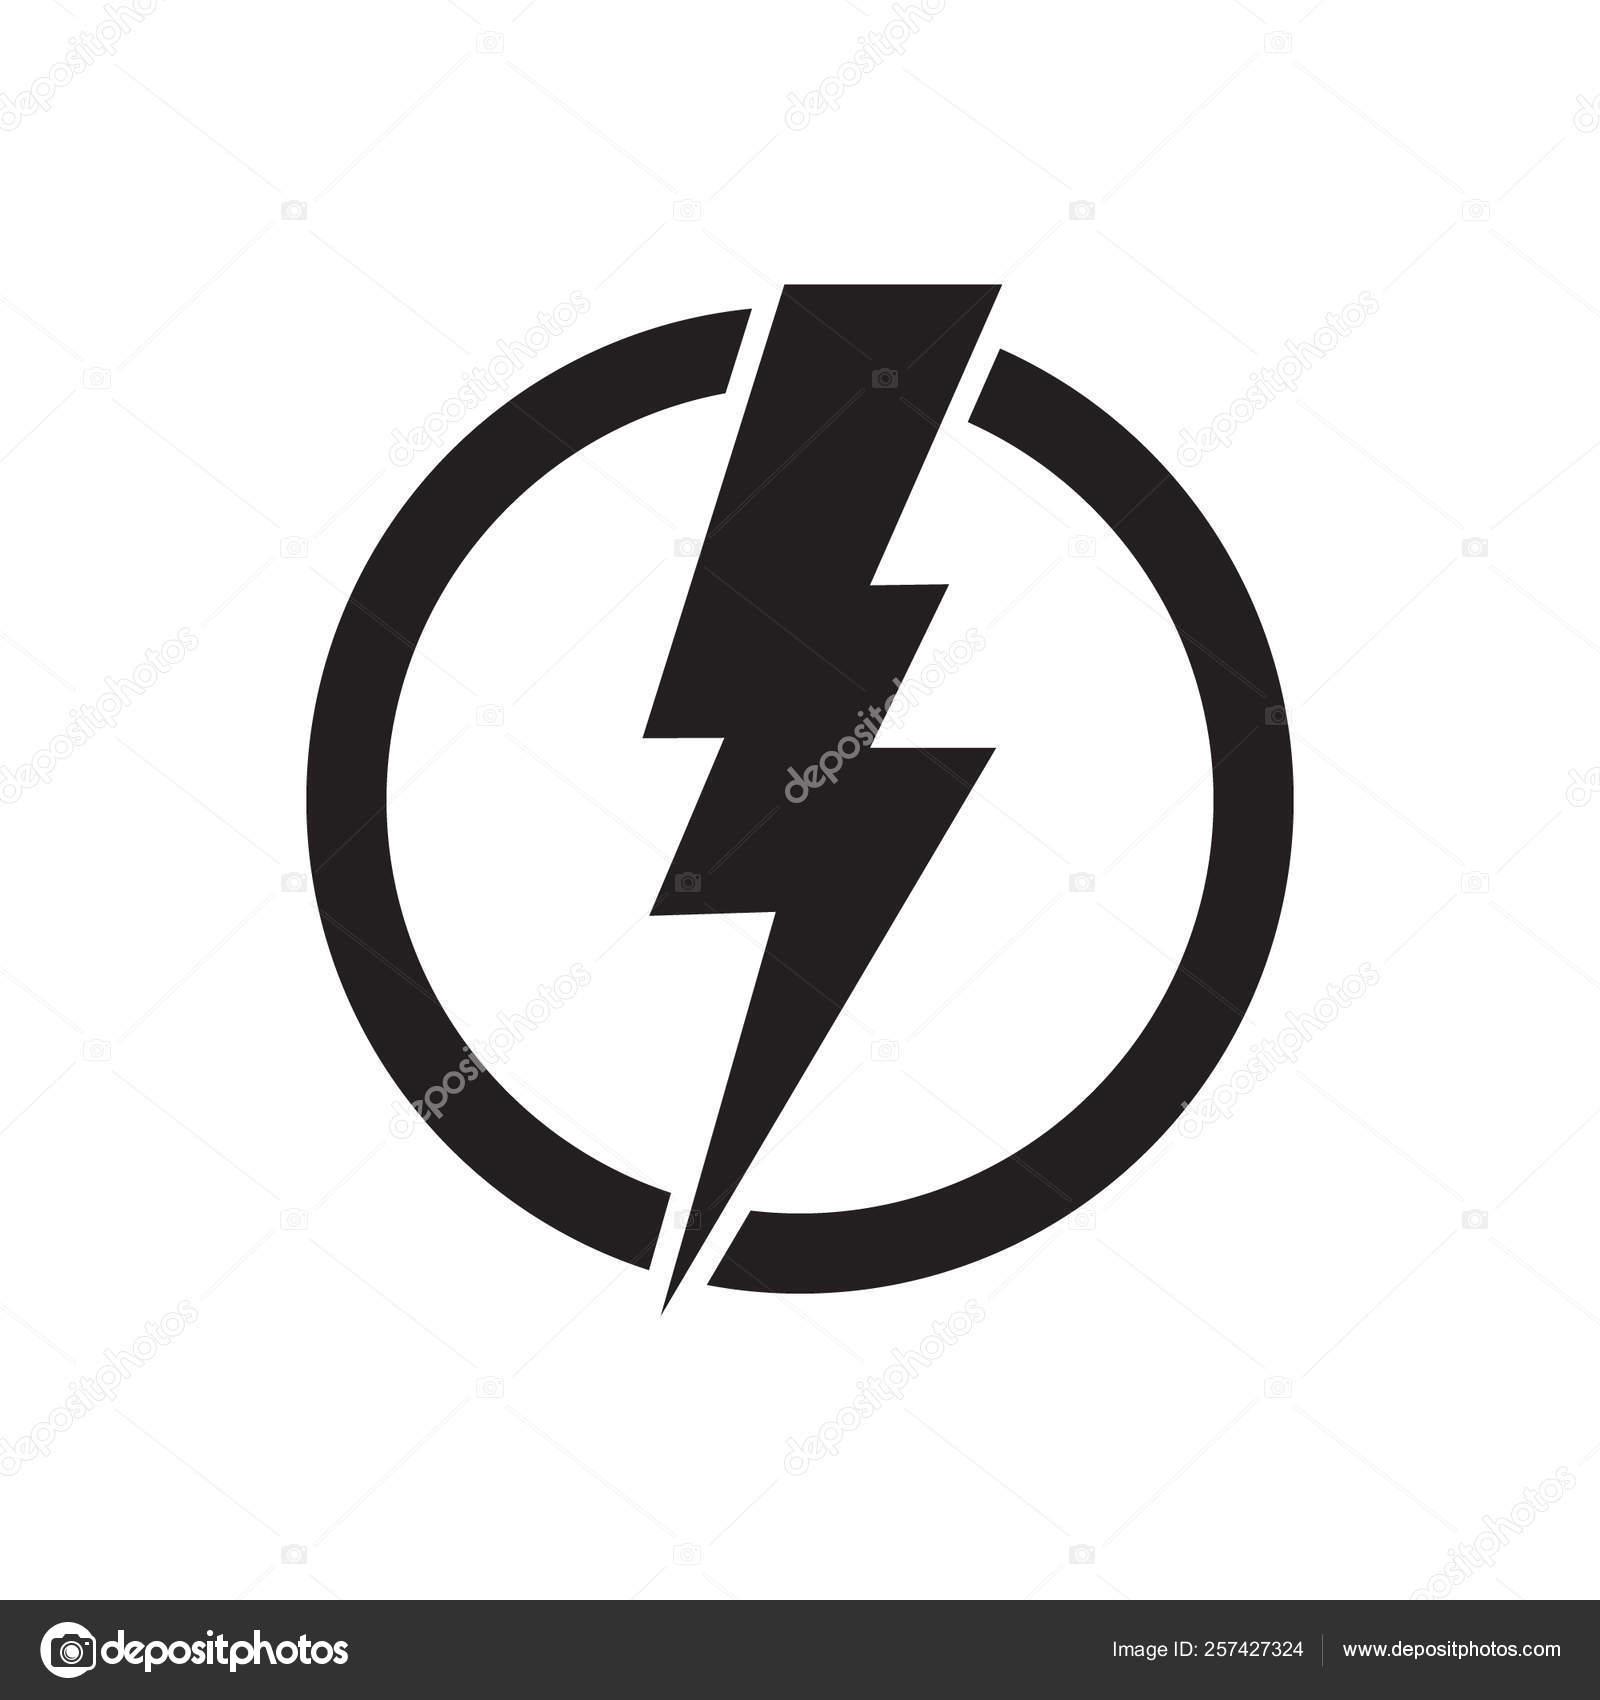 lightning electric power vector logo design element energy thunder electricity stock vector c dmvector 257427324 lightning electric power vector logo design element energy thunder electricity stock vector c dmvector 257427324